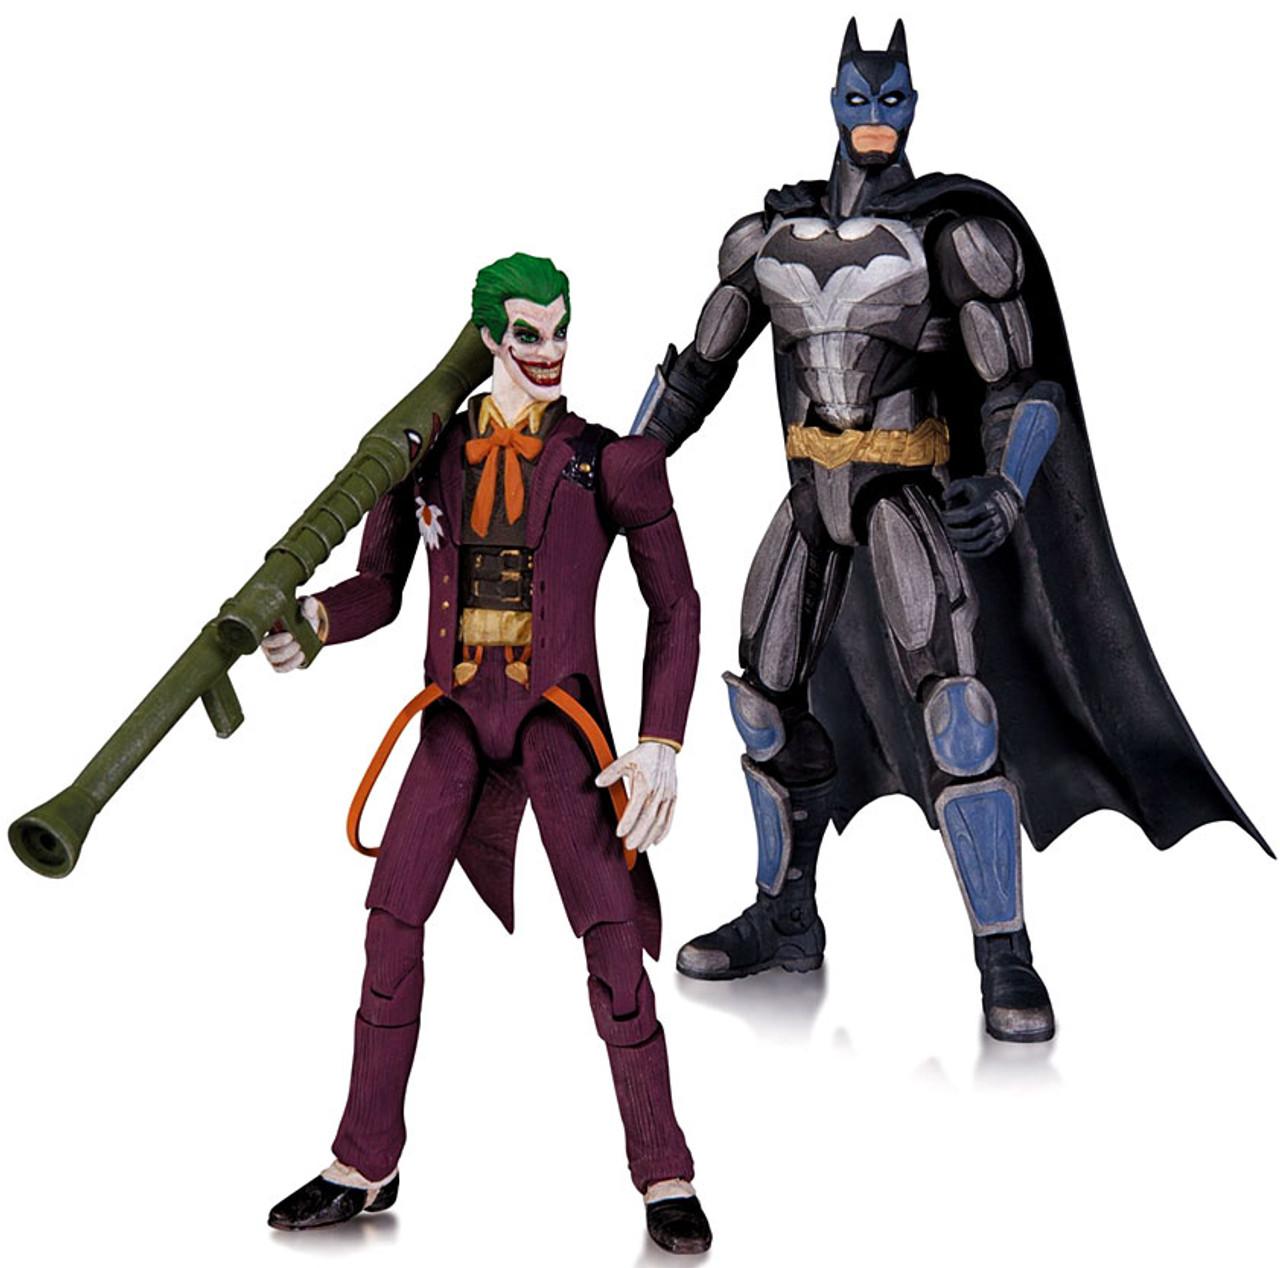 Injustice: Gods Among Us Batman & The Joker Action Figure 2-Pack